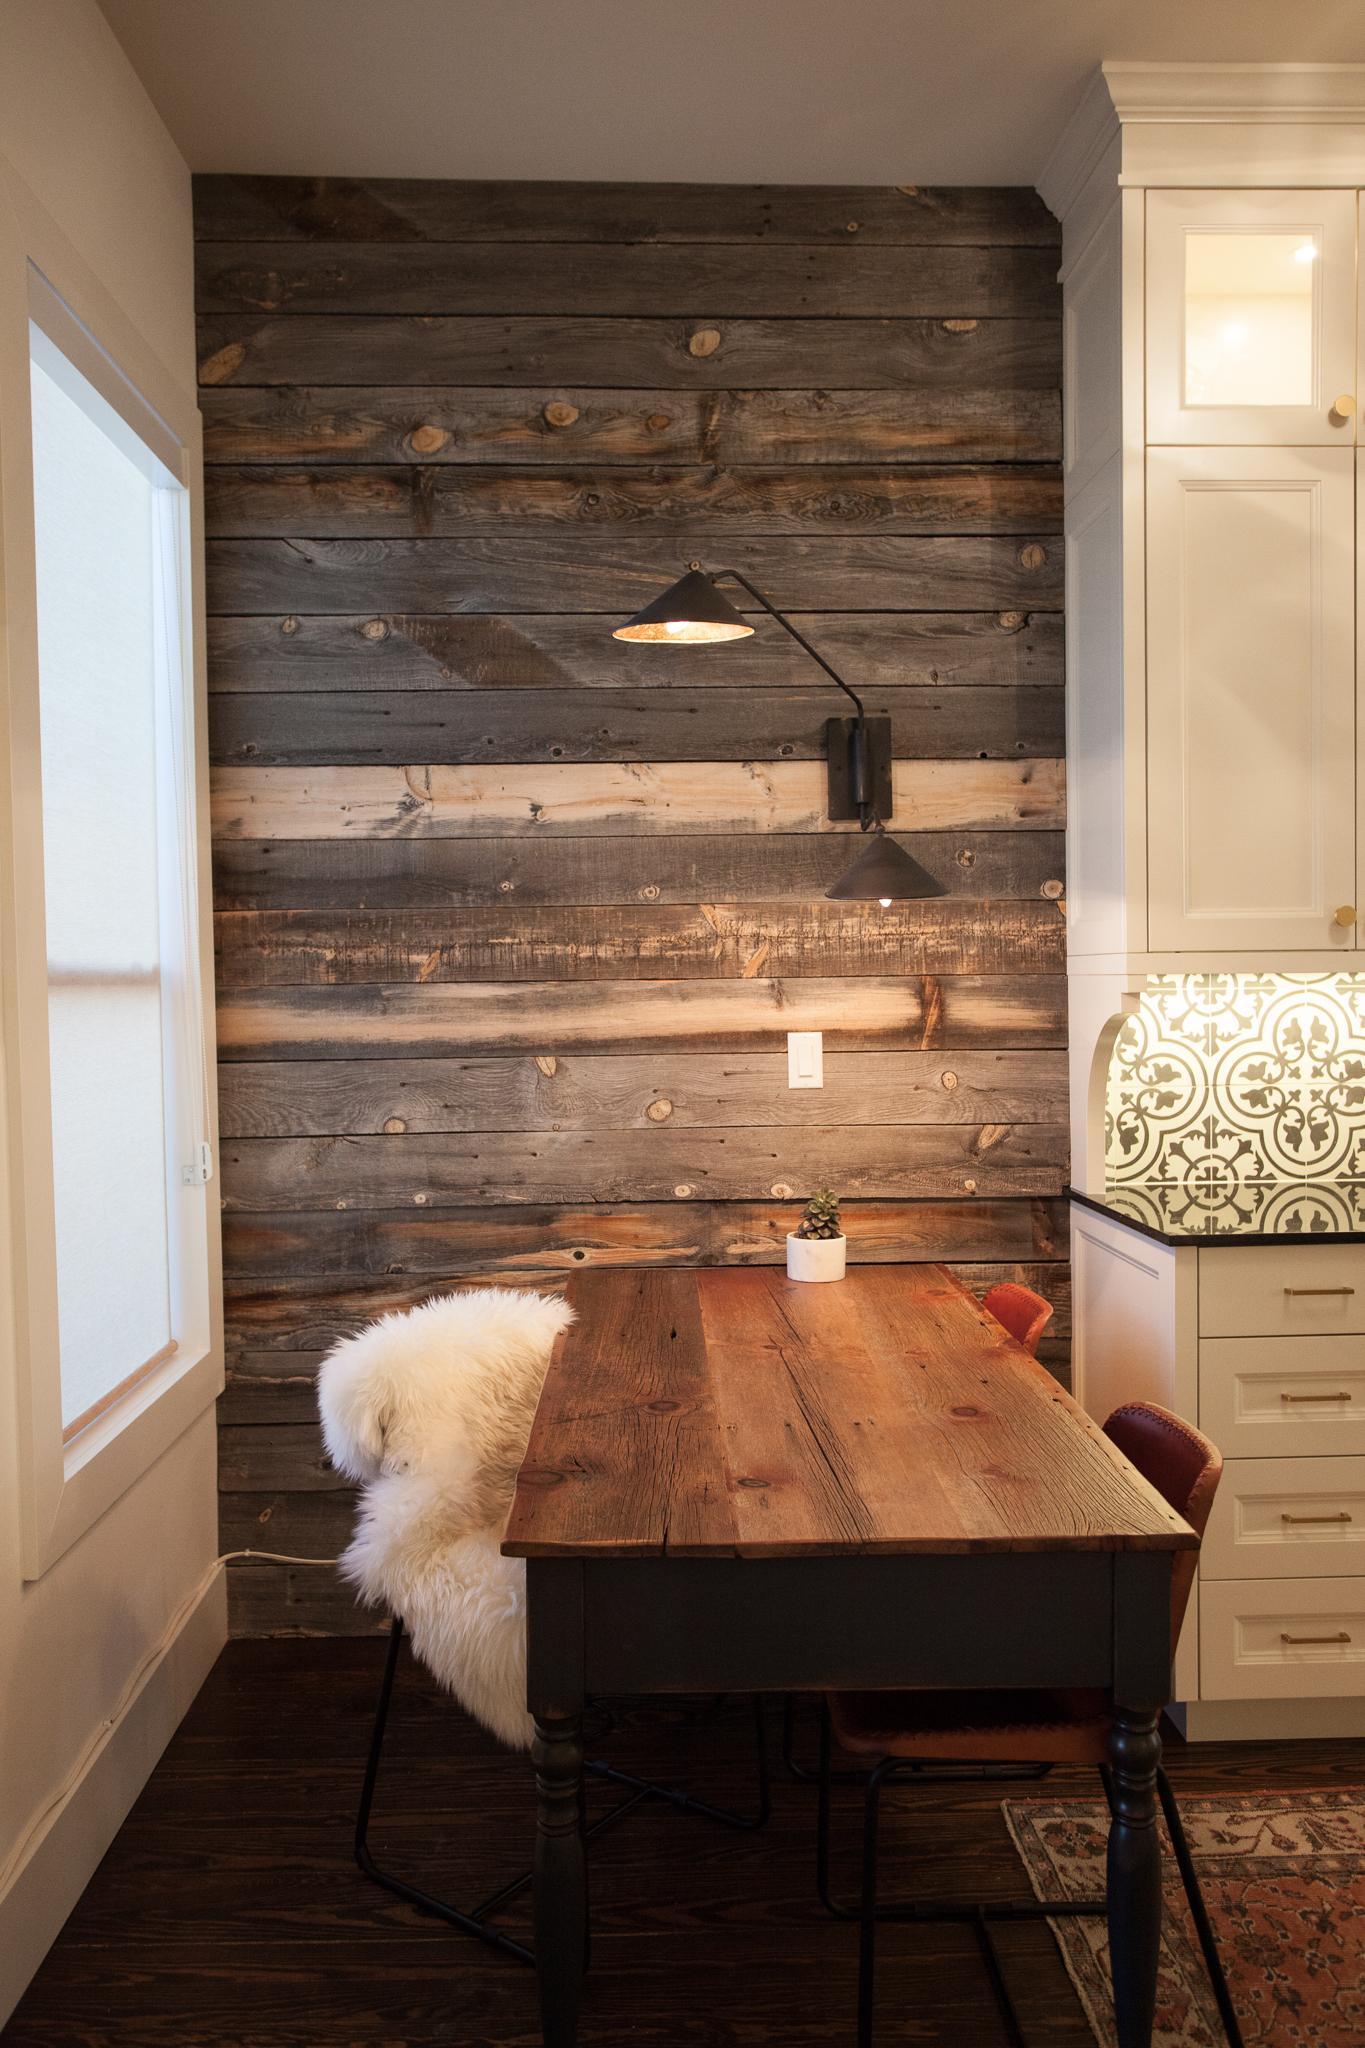 Aspen Leaf Kitchens Showroom-31